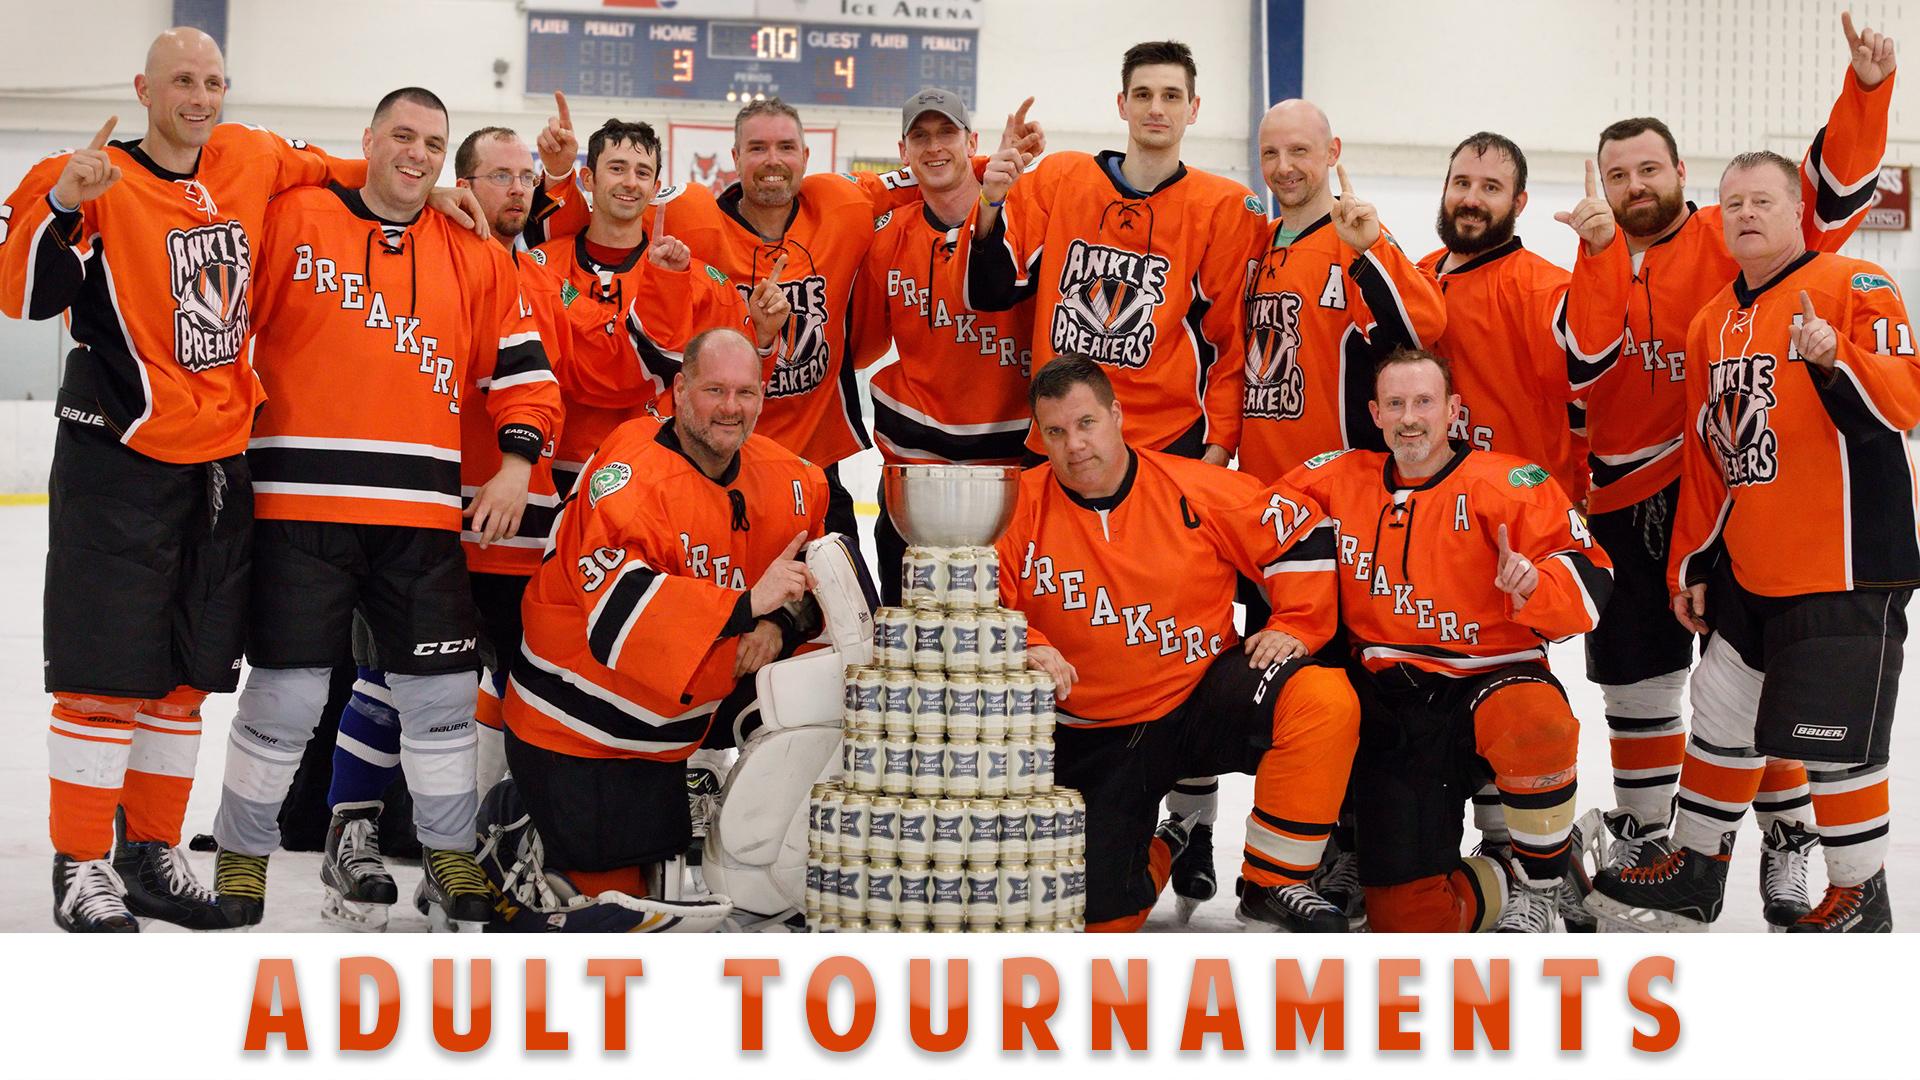 Premier Hockey Tournaments